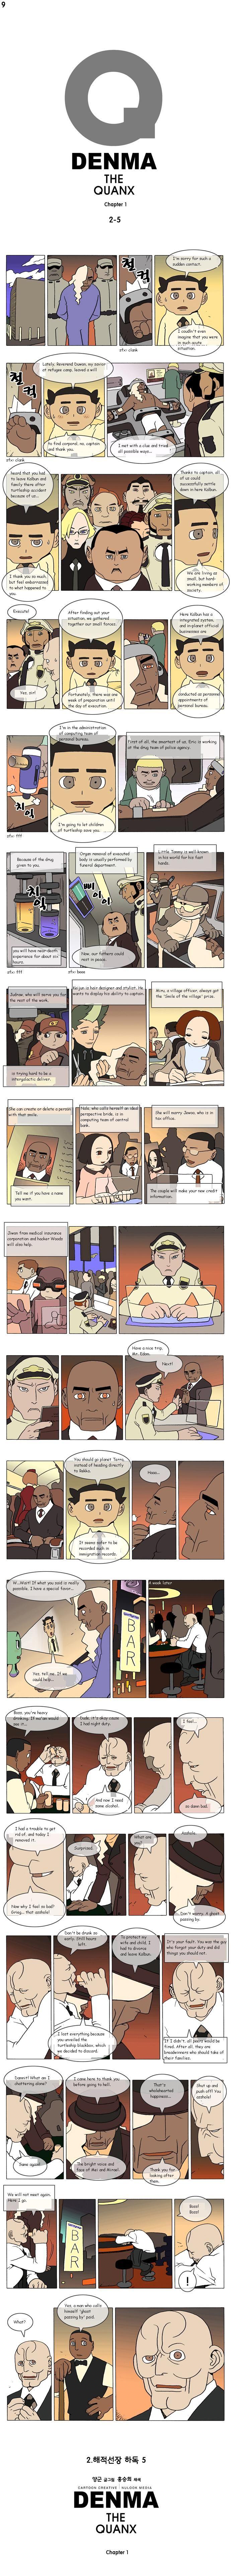 Denma 9 Page 1